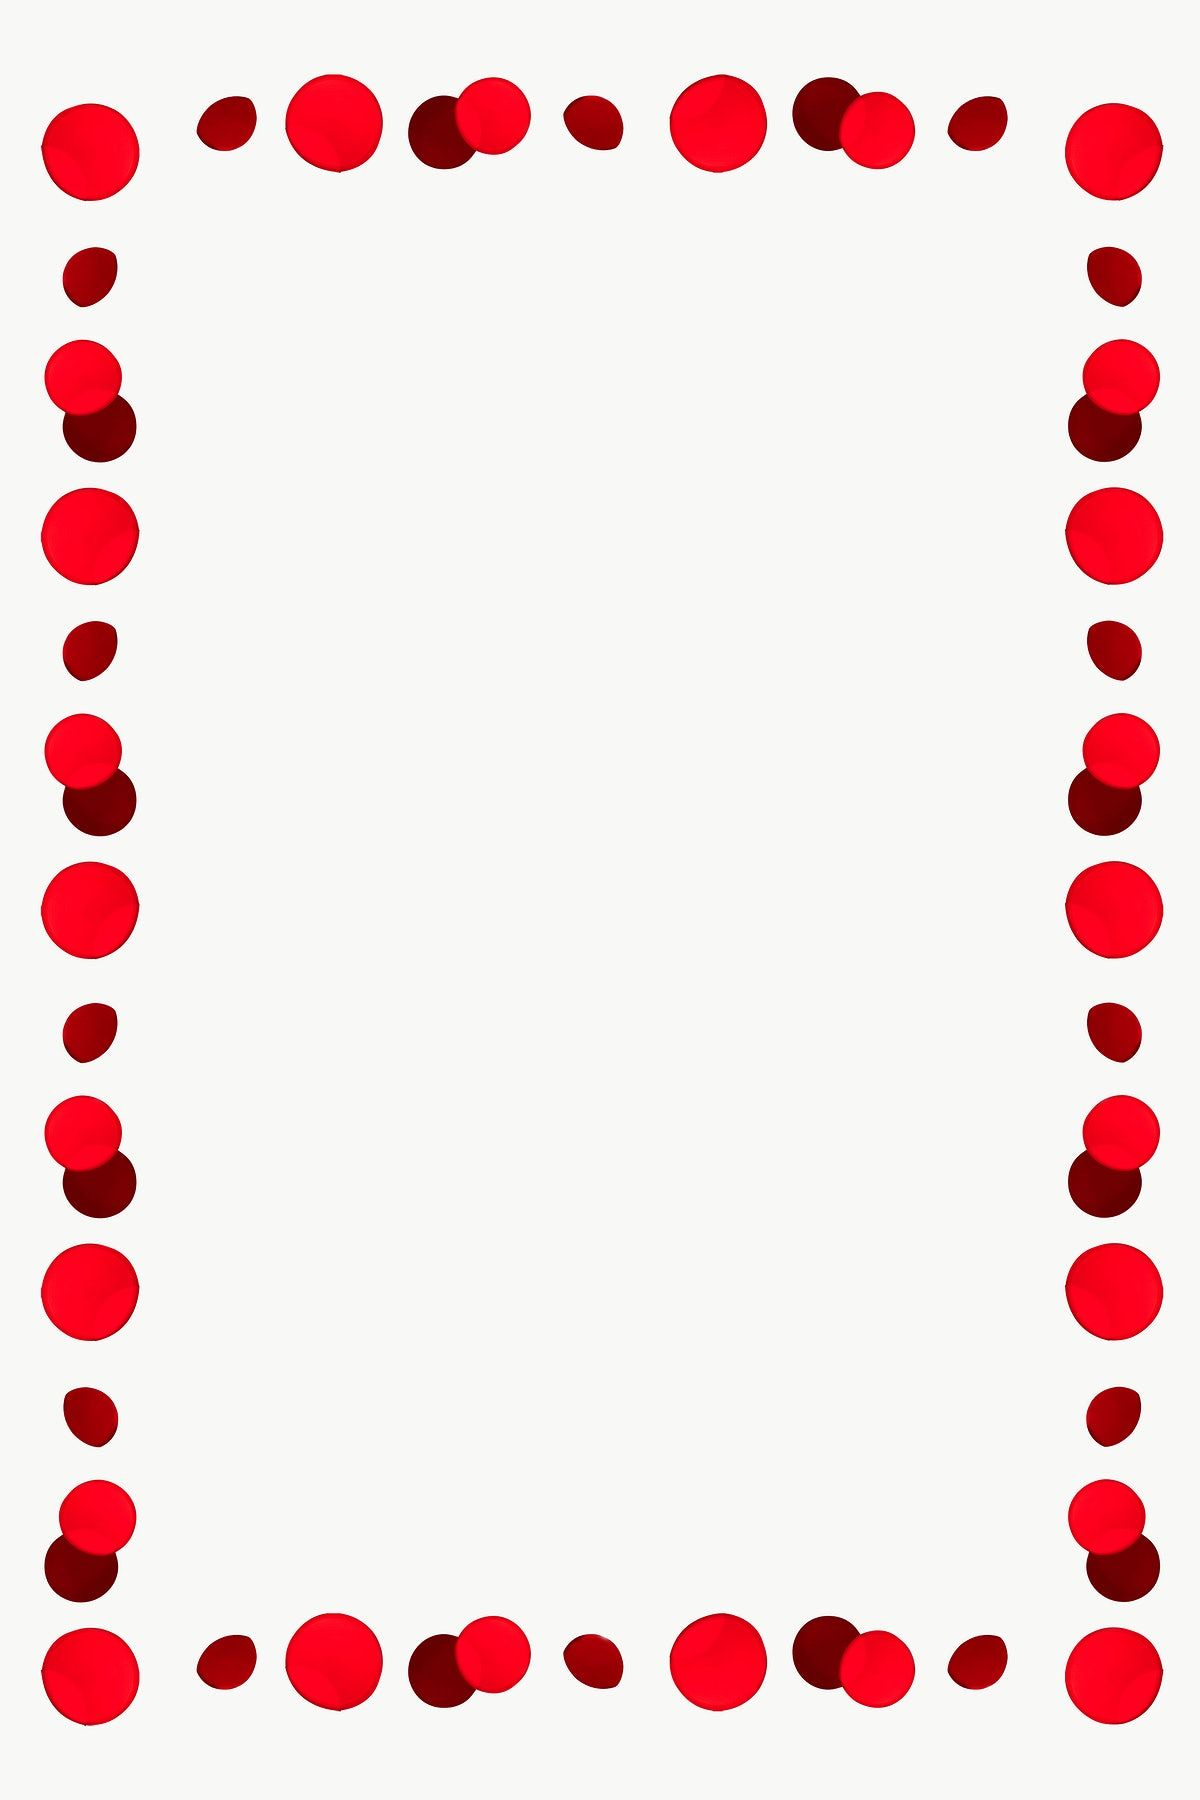 Pin By Solradiante Brillante On Hojas Decoradas Design Element Frame Design Red Dots